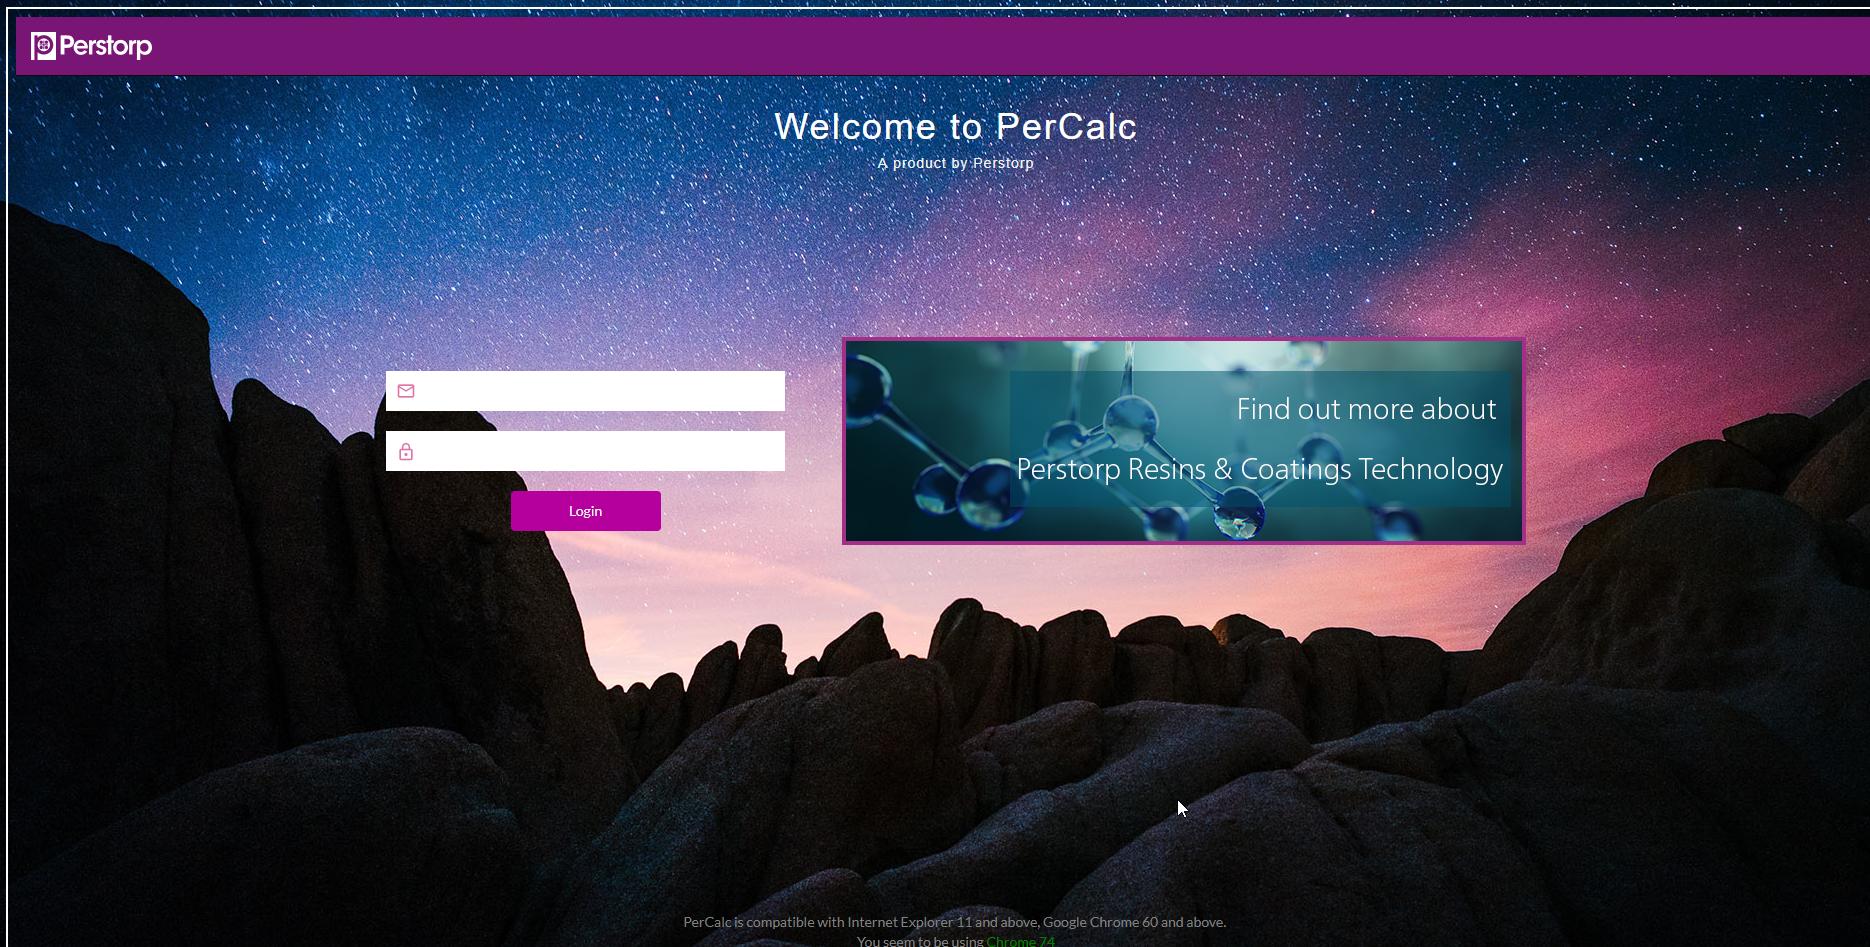 PerCalc